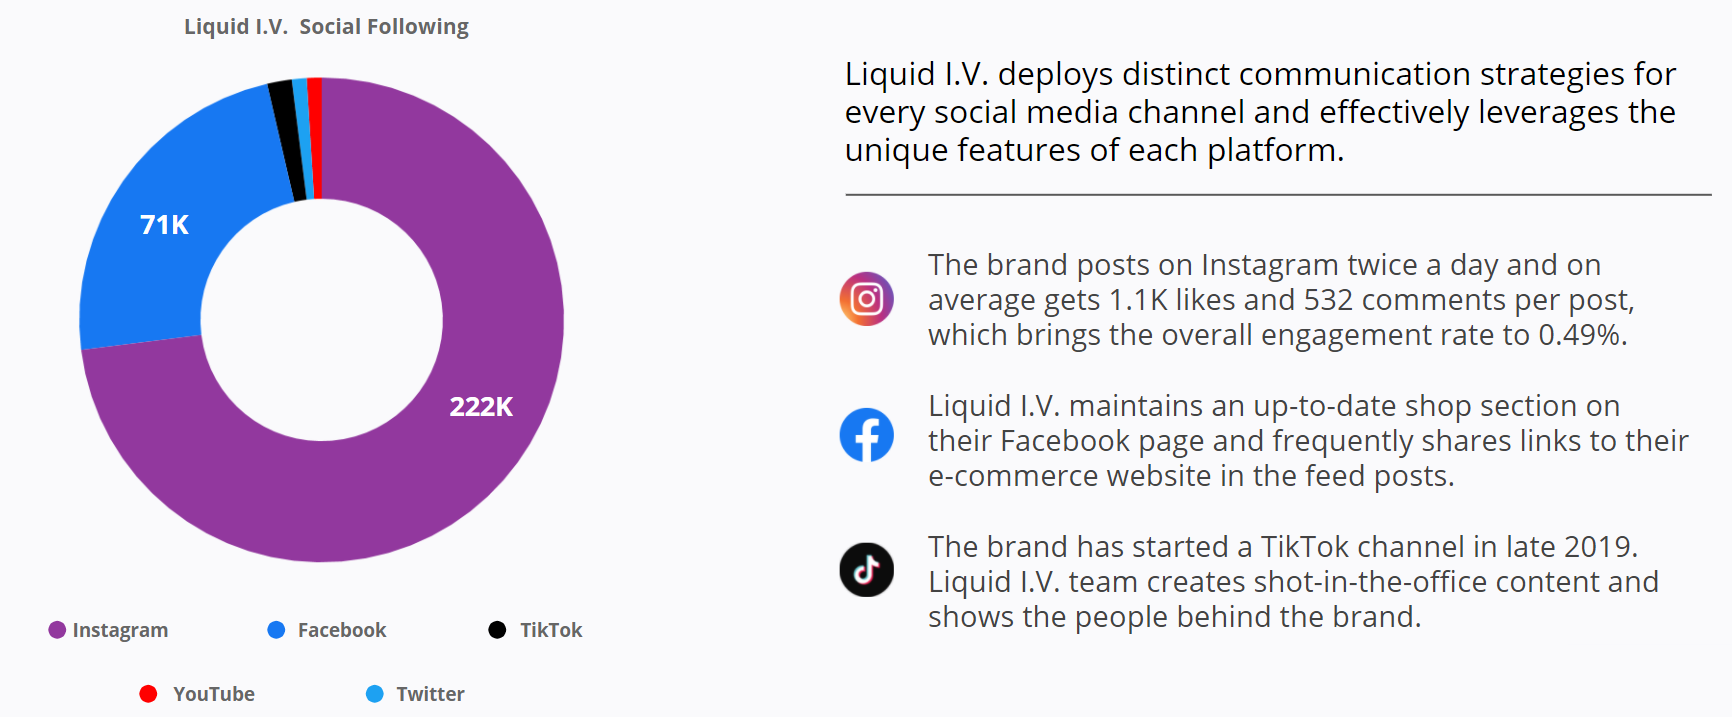 Liquid I.V. - Social Following